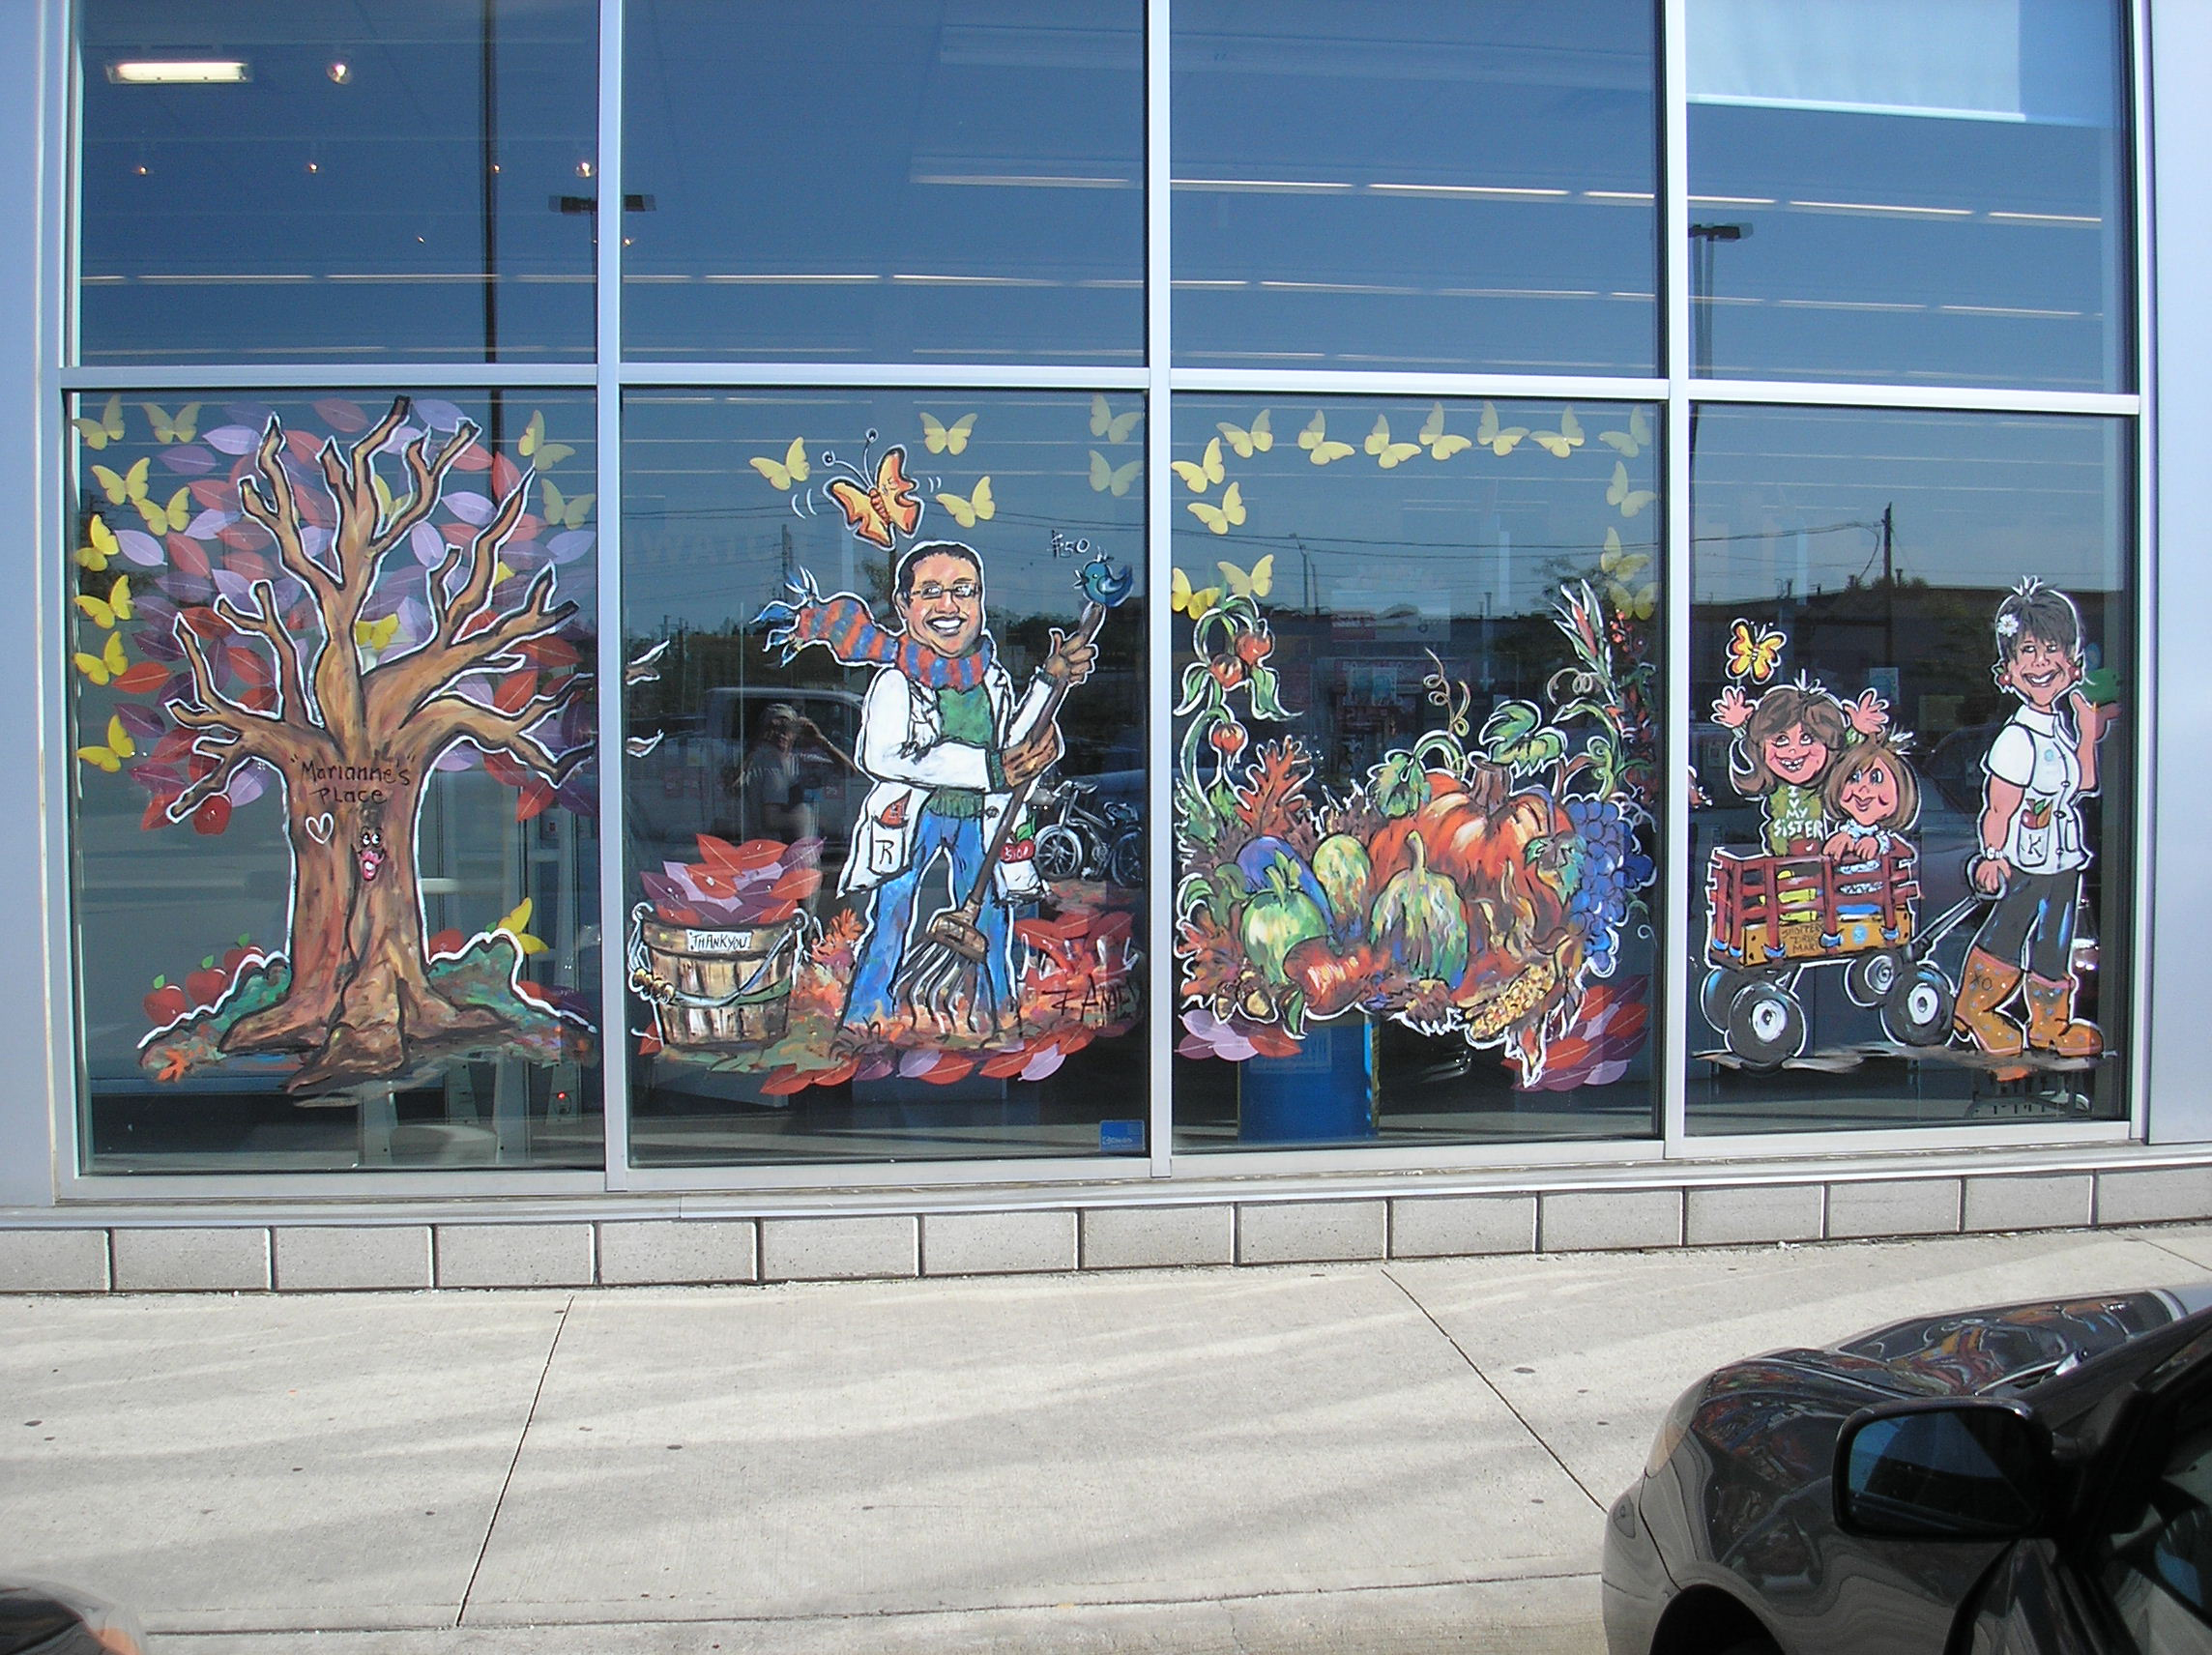 Window art work on Shopper's Drug Mart promoting a Fund raiser for Marianne's Place, (women shelter) in Guelph.